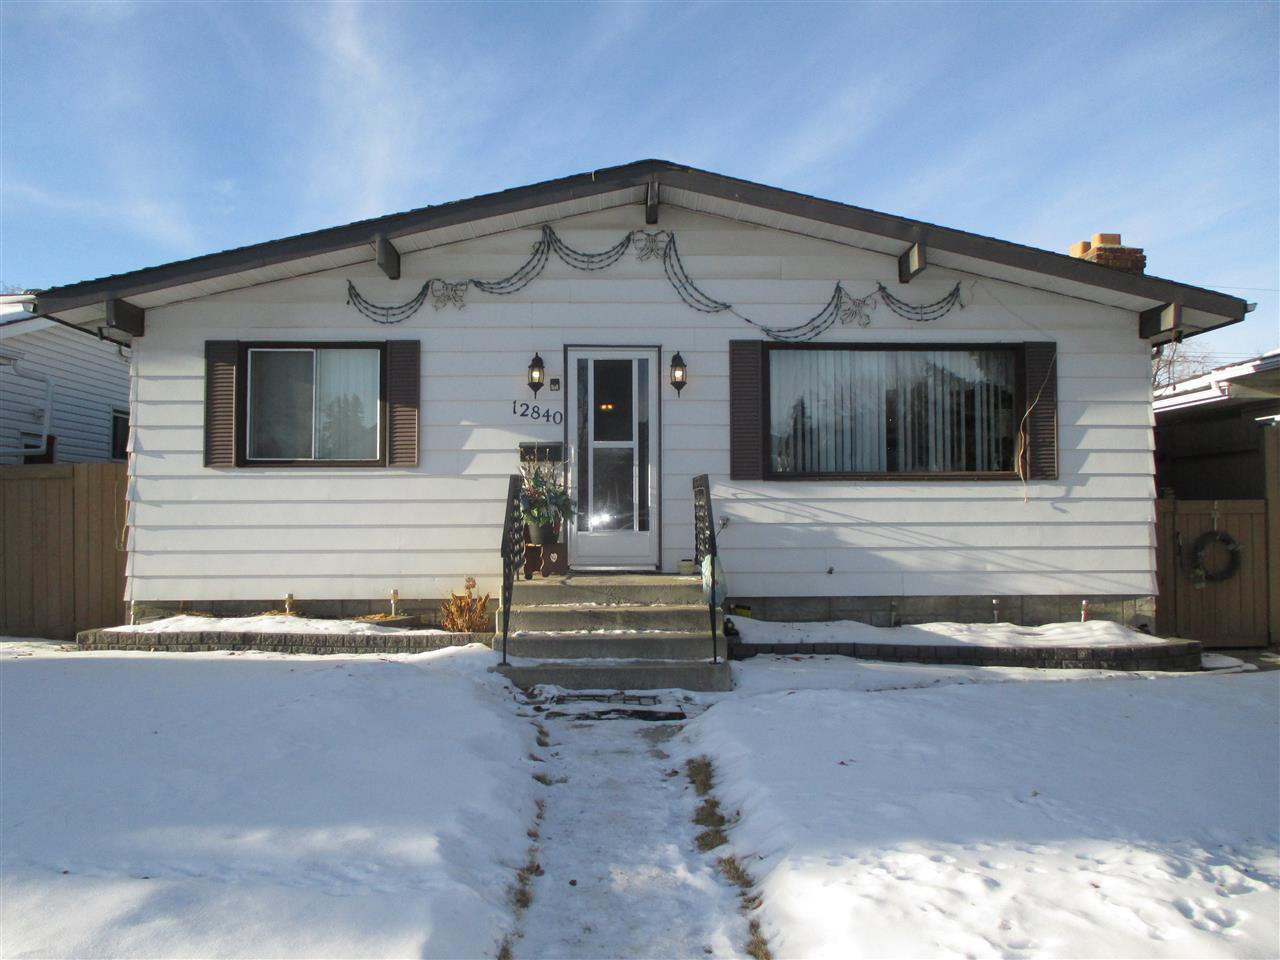 Main Photo: 12840 132 Street in Edmonton: Zone 01 House for sale : MLS®# E4221263